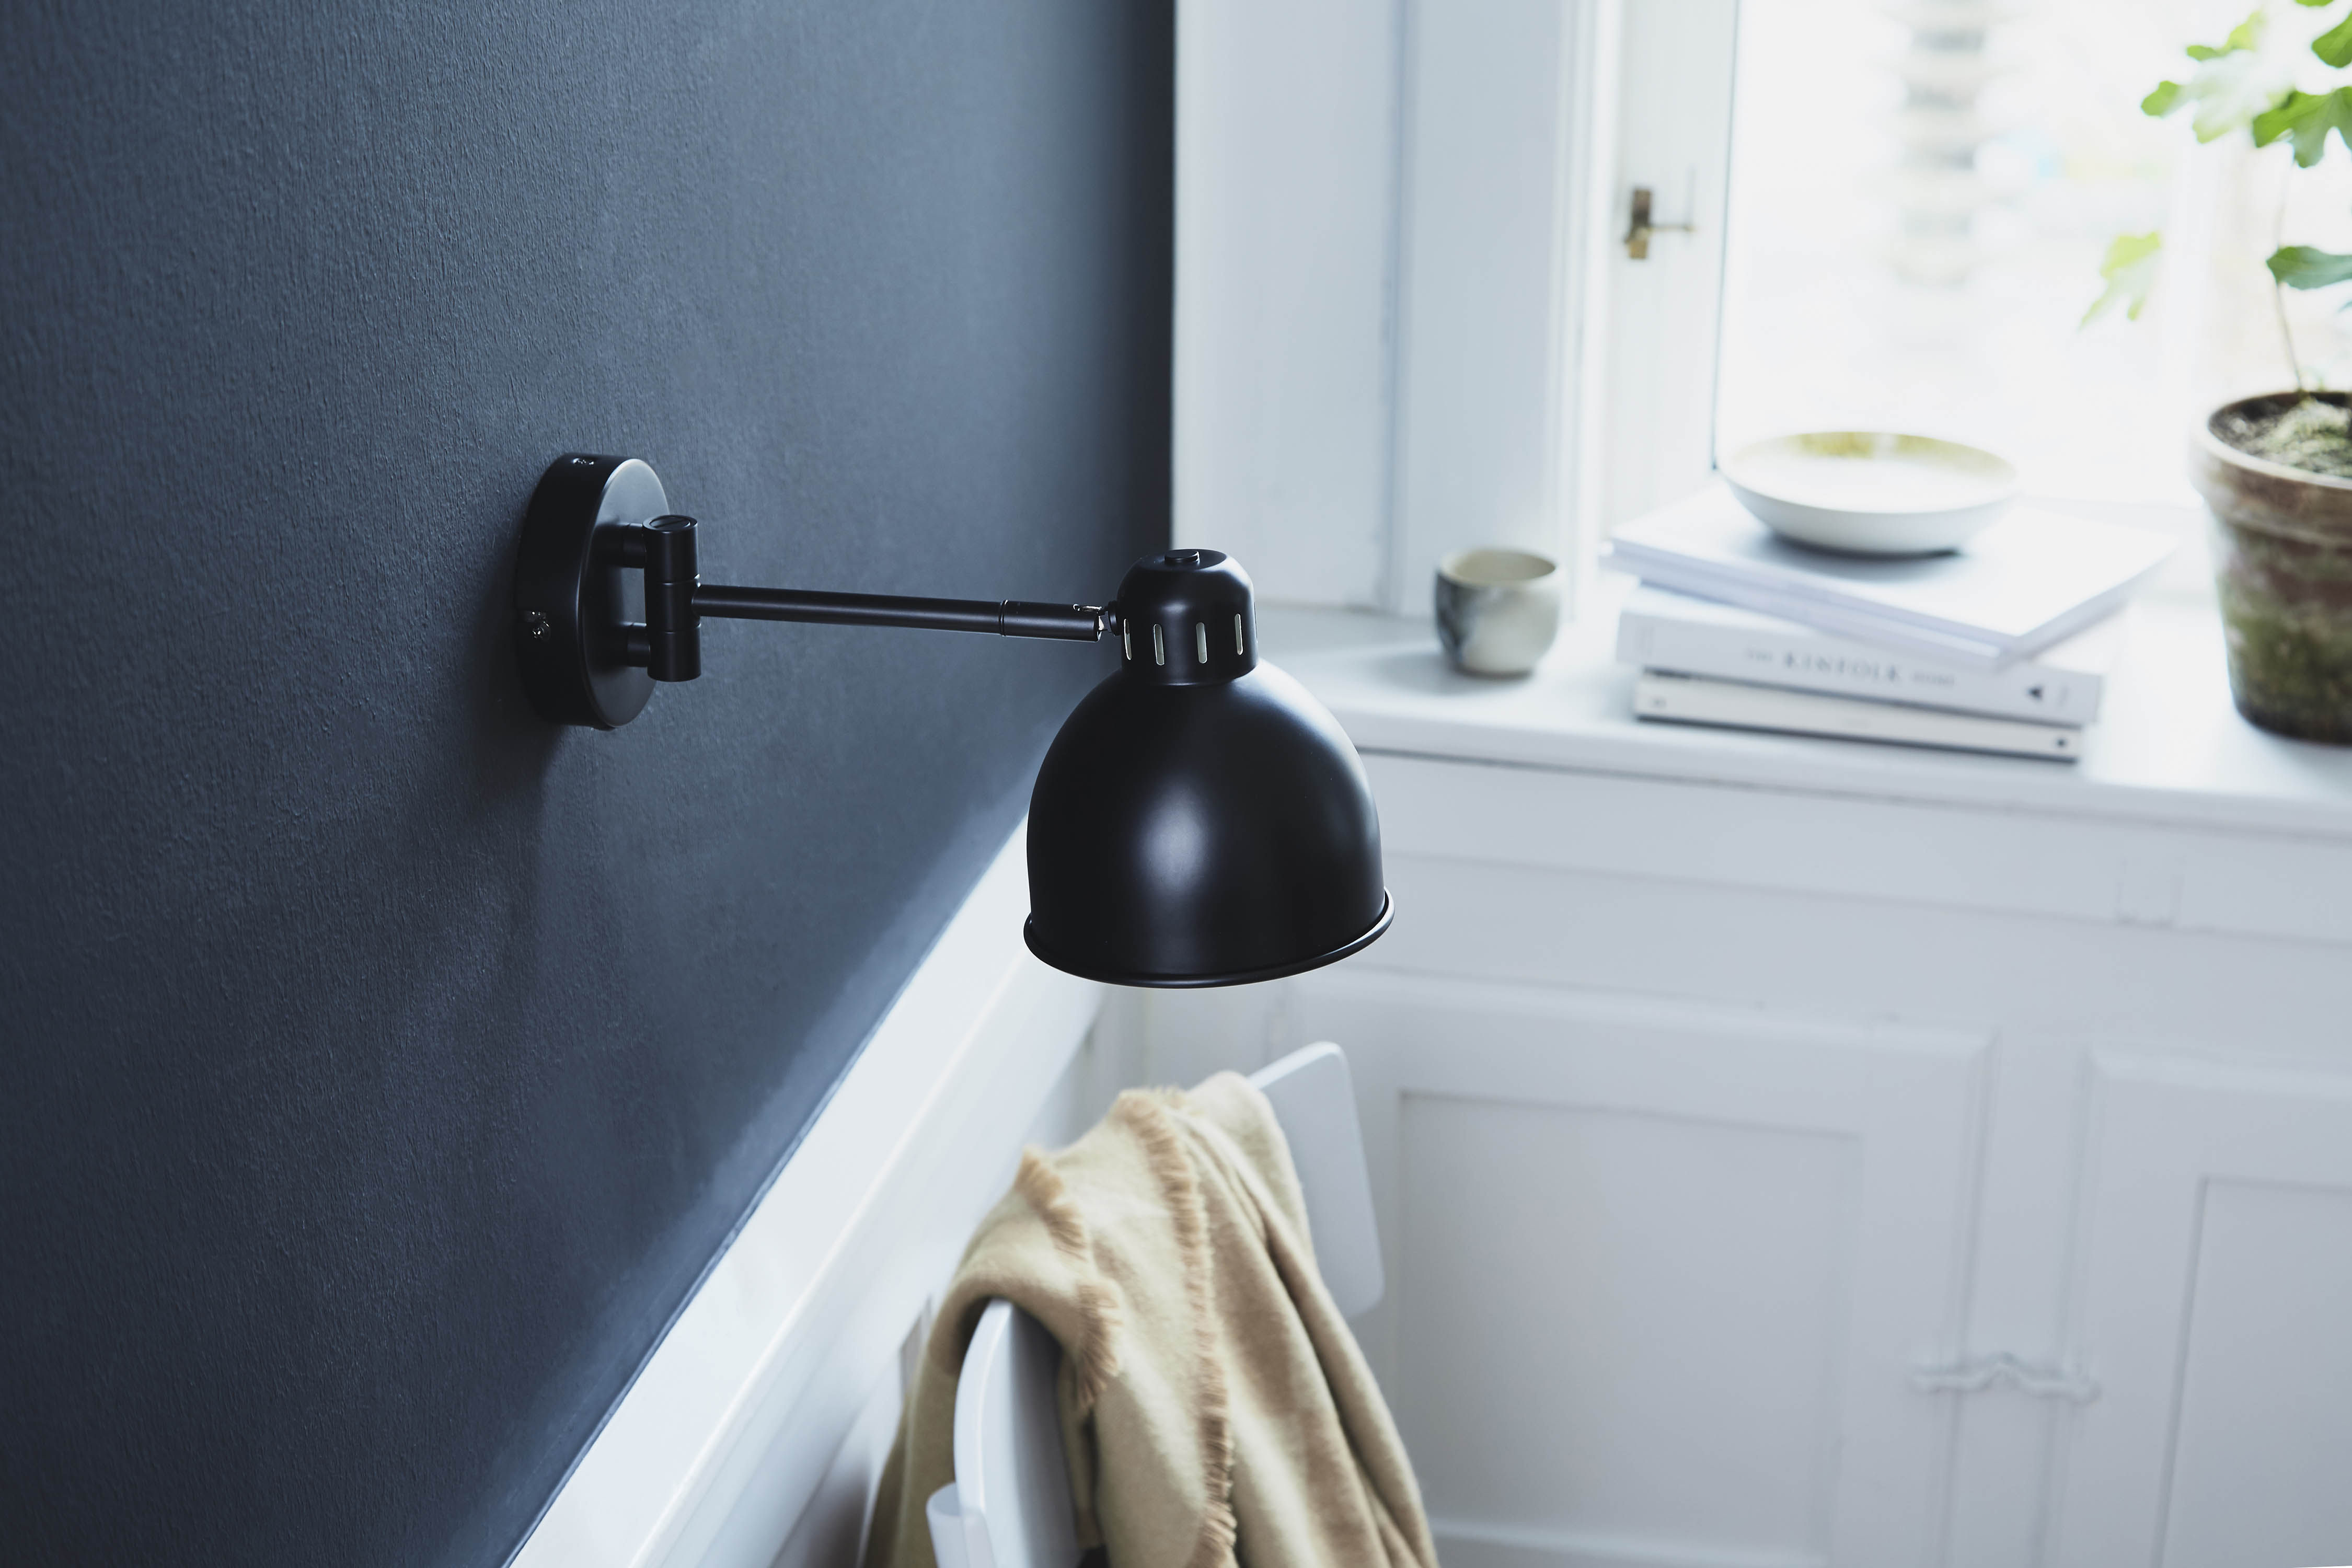 applique avec prise job mini l 30 cm noir mat frandsen made in design. Black Bedroom Furniture Sets. Home Design Ideas